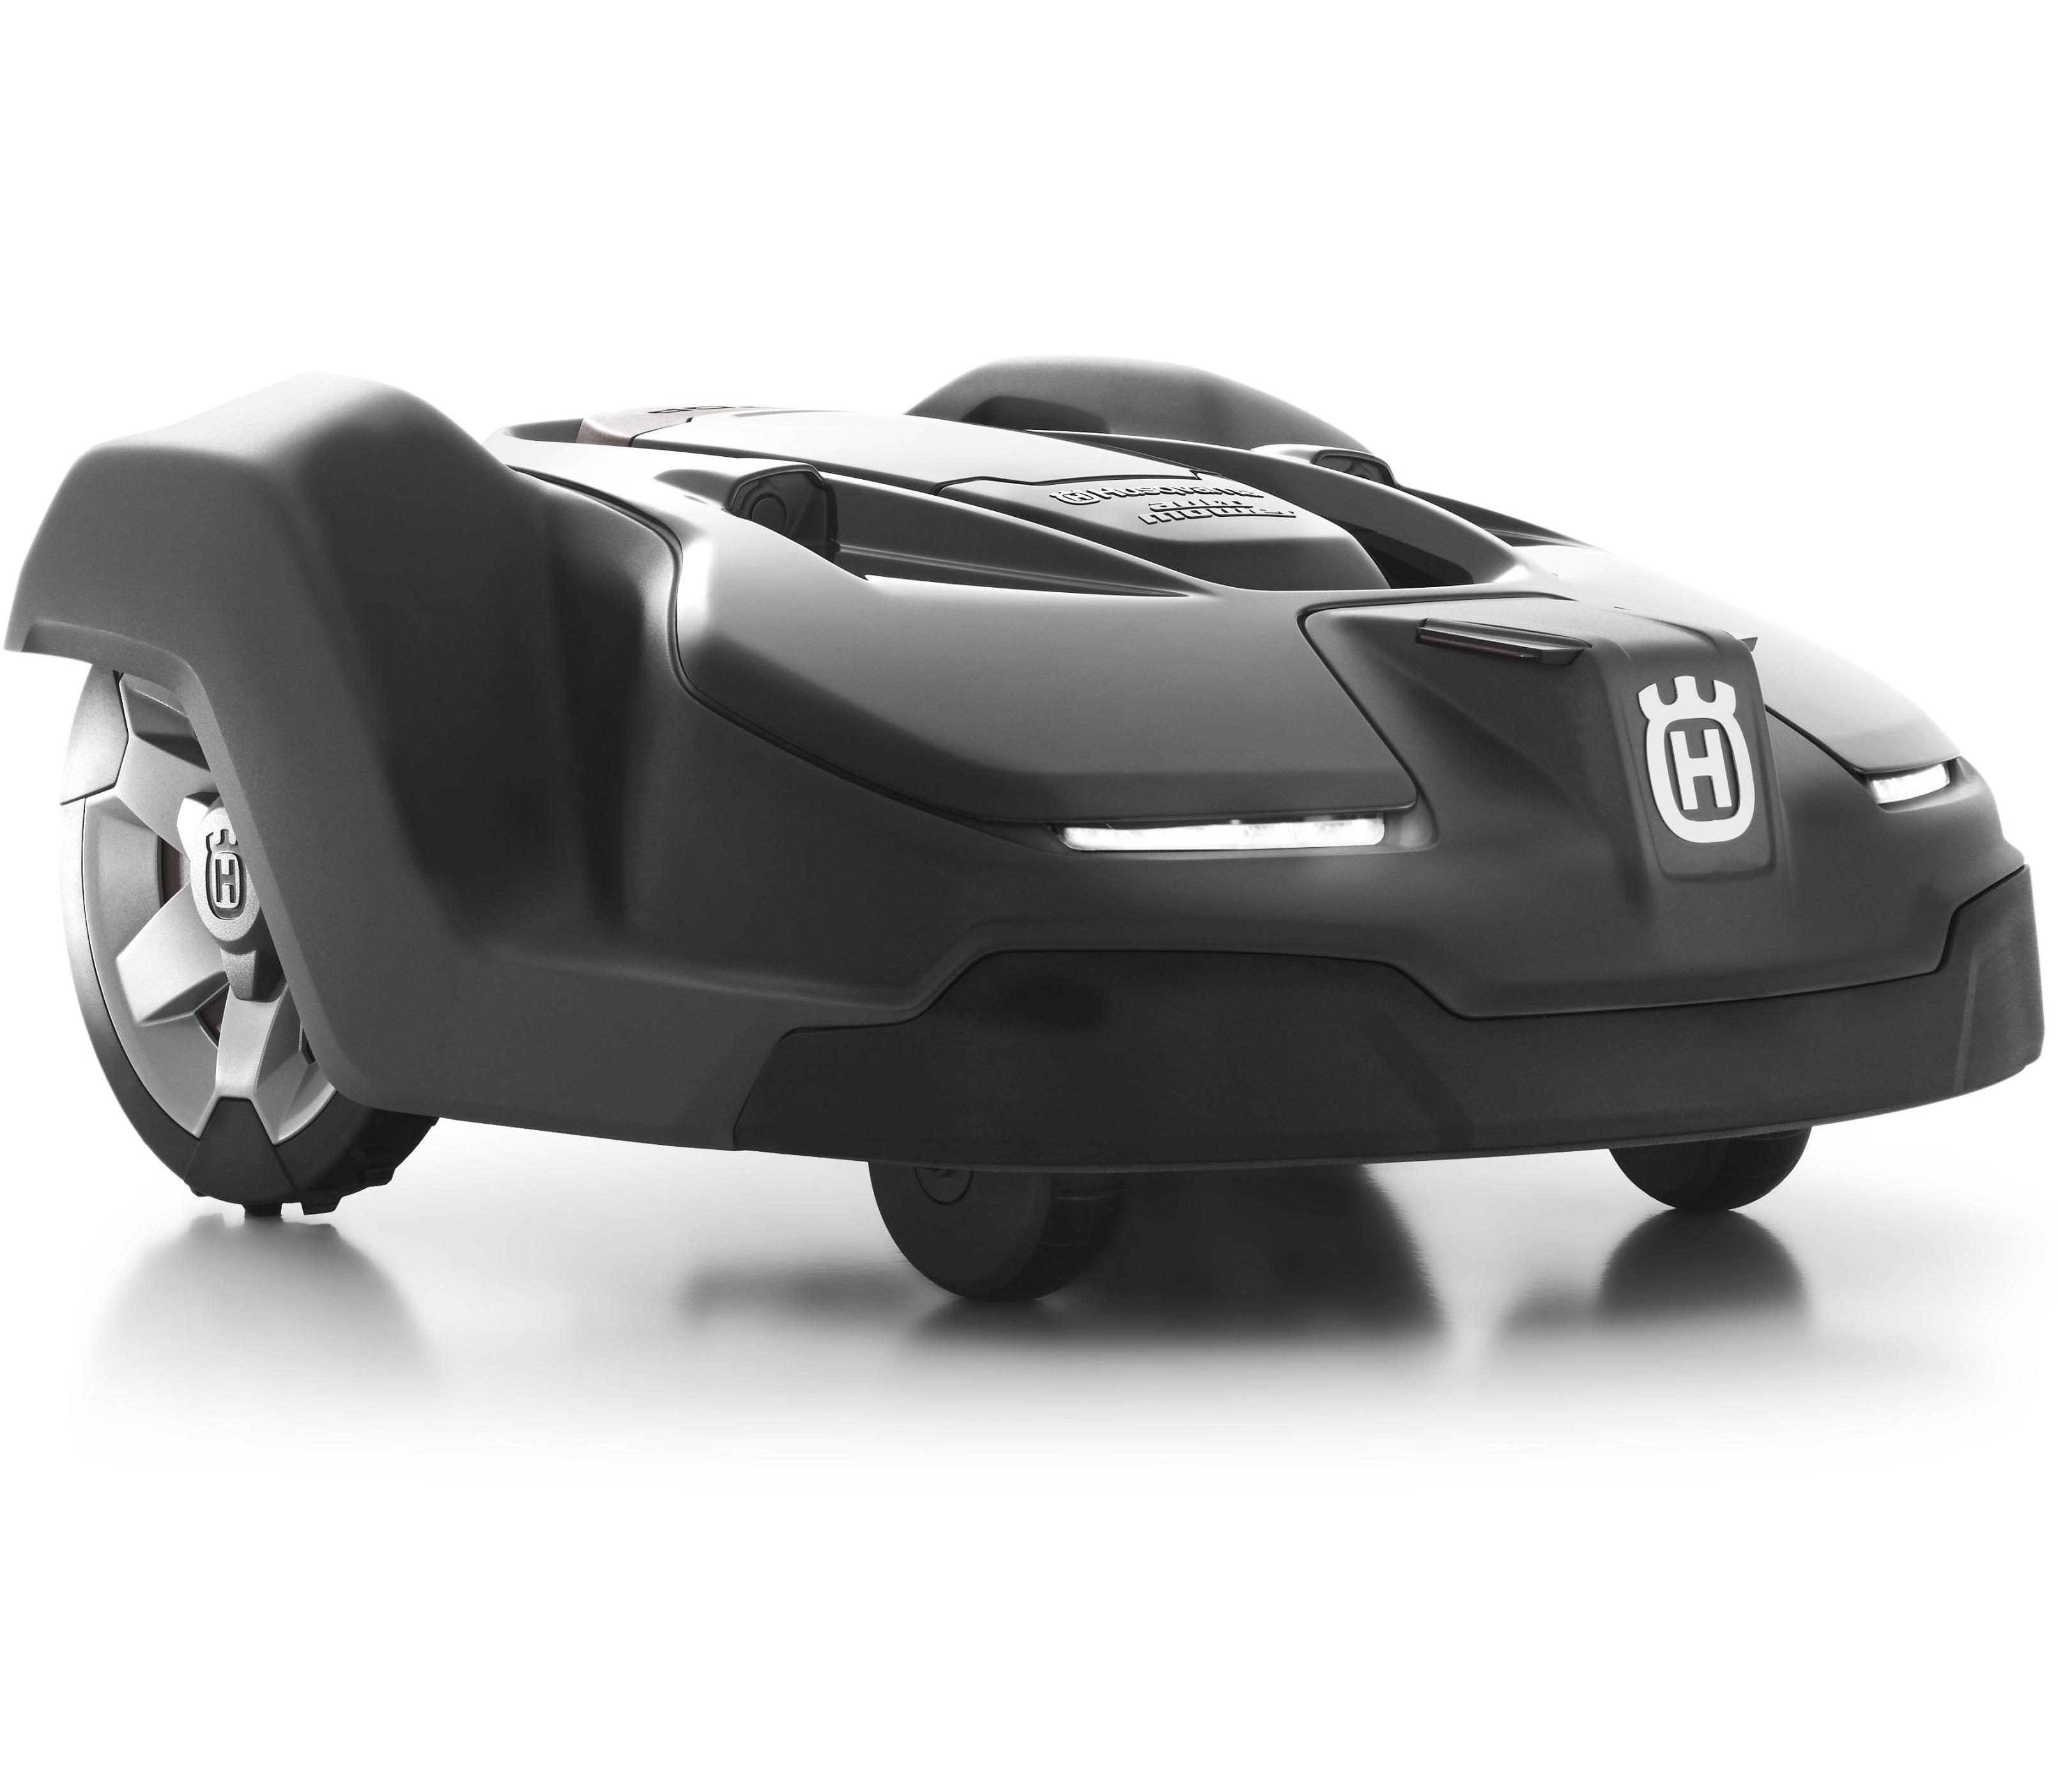 m hroboter husqvarna automower 430x werth motorger te. Black Bedroom Furniture Sets. Home Design Ideas